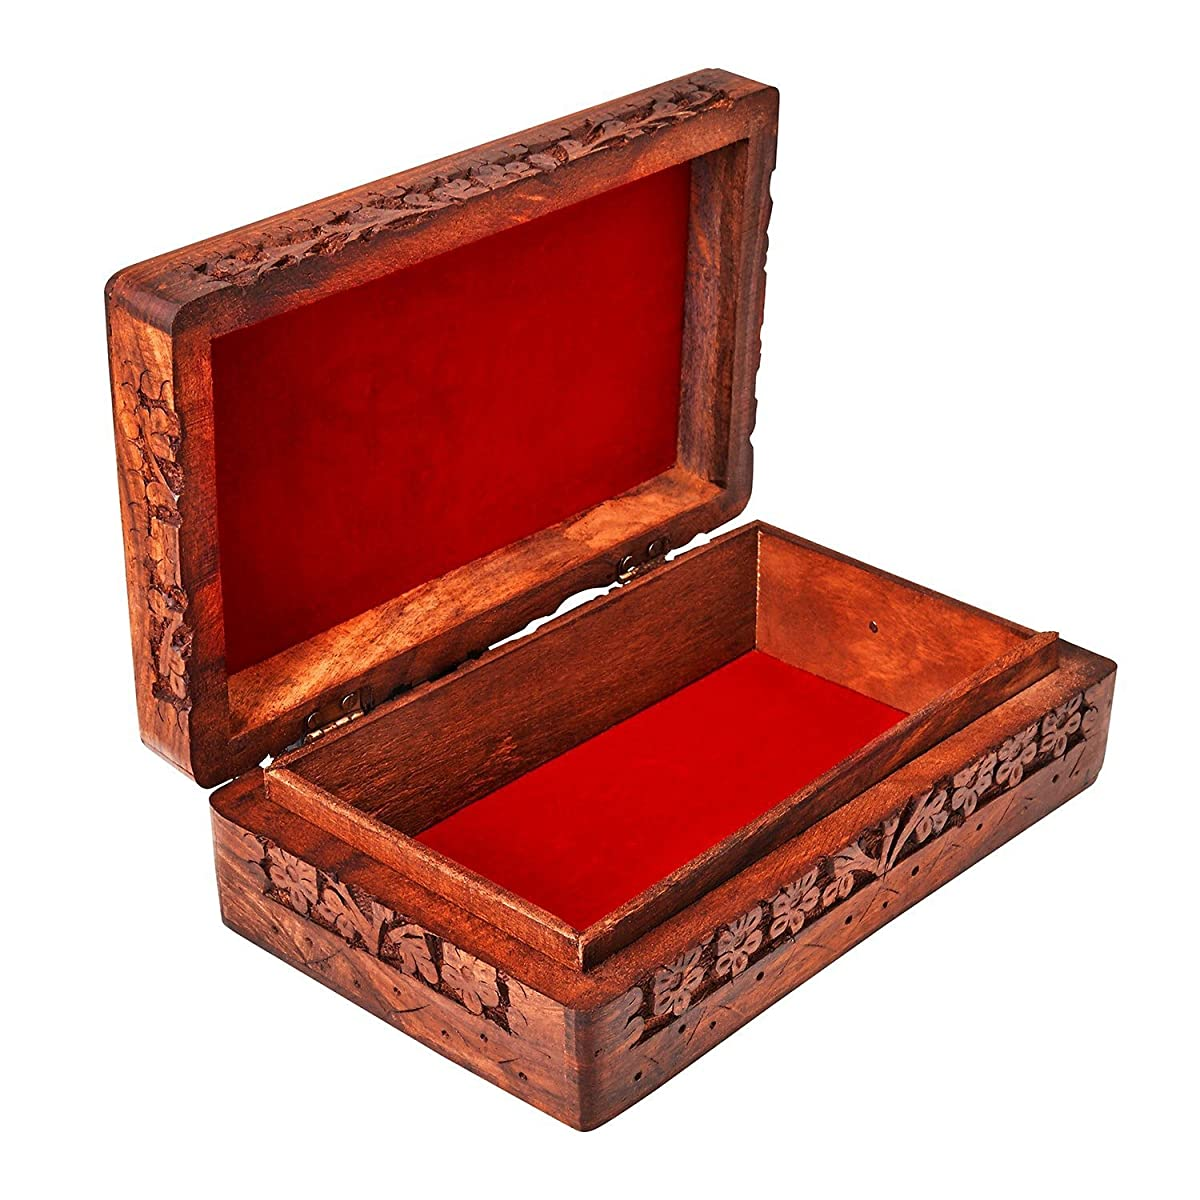 Handmade Decorative Wooden Jewelry Box Jewelry Organizer Keepsake Box Treasure Chest Trinket Holder Watch Box Storage Box 8 x 5 Inches Birthday Housewarming Gift Ideas For Men & Women